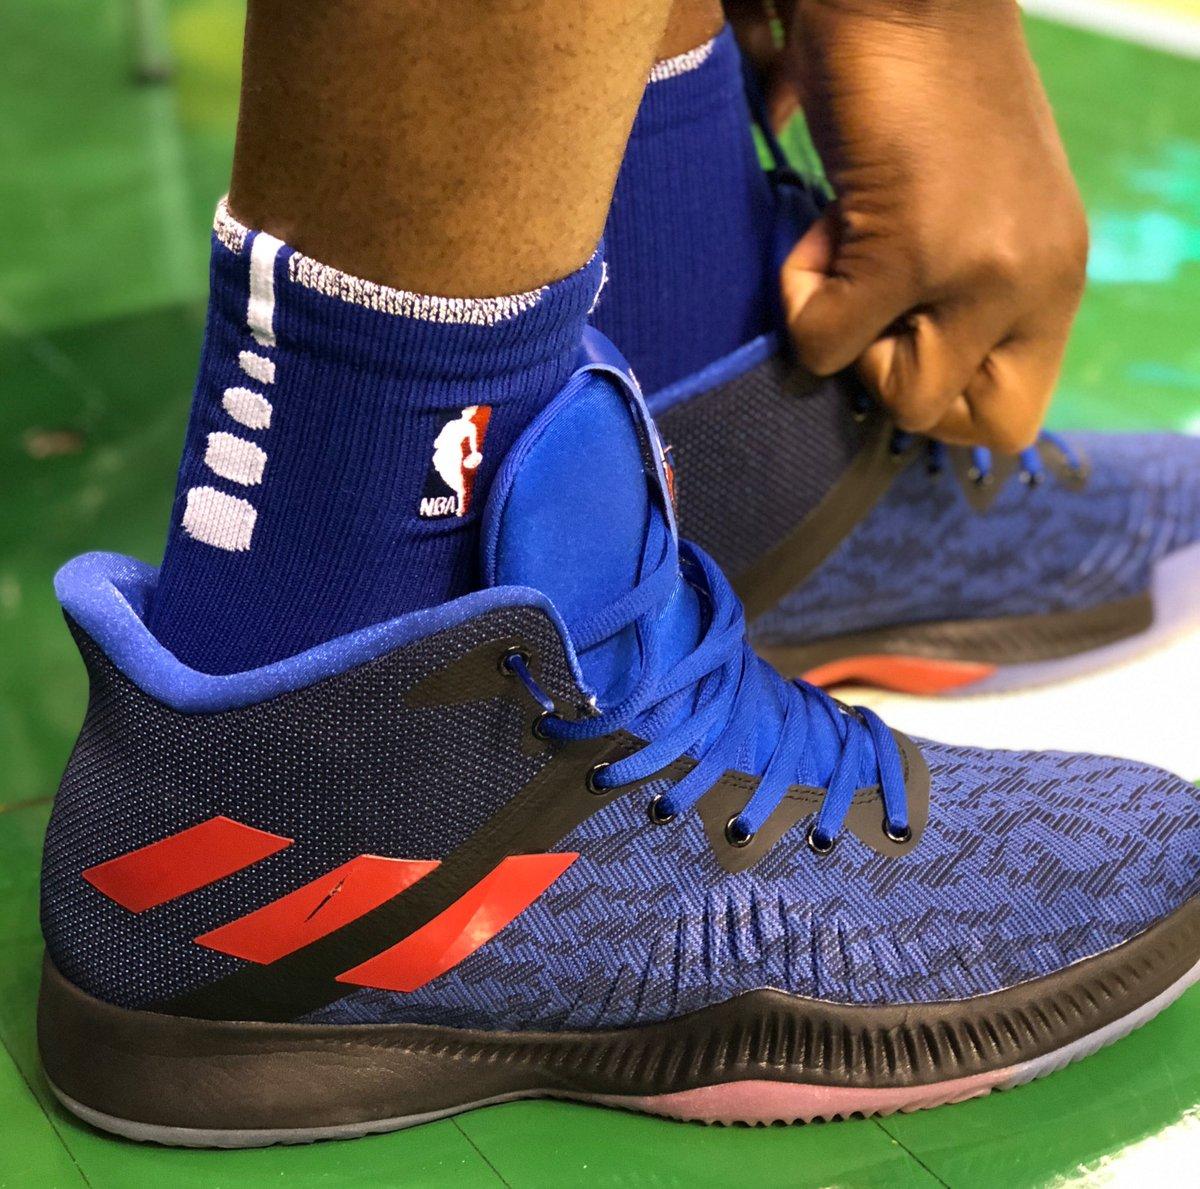 #NBAKicks in Boston for @JoelEmbiid!